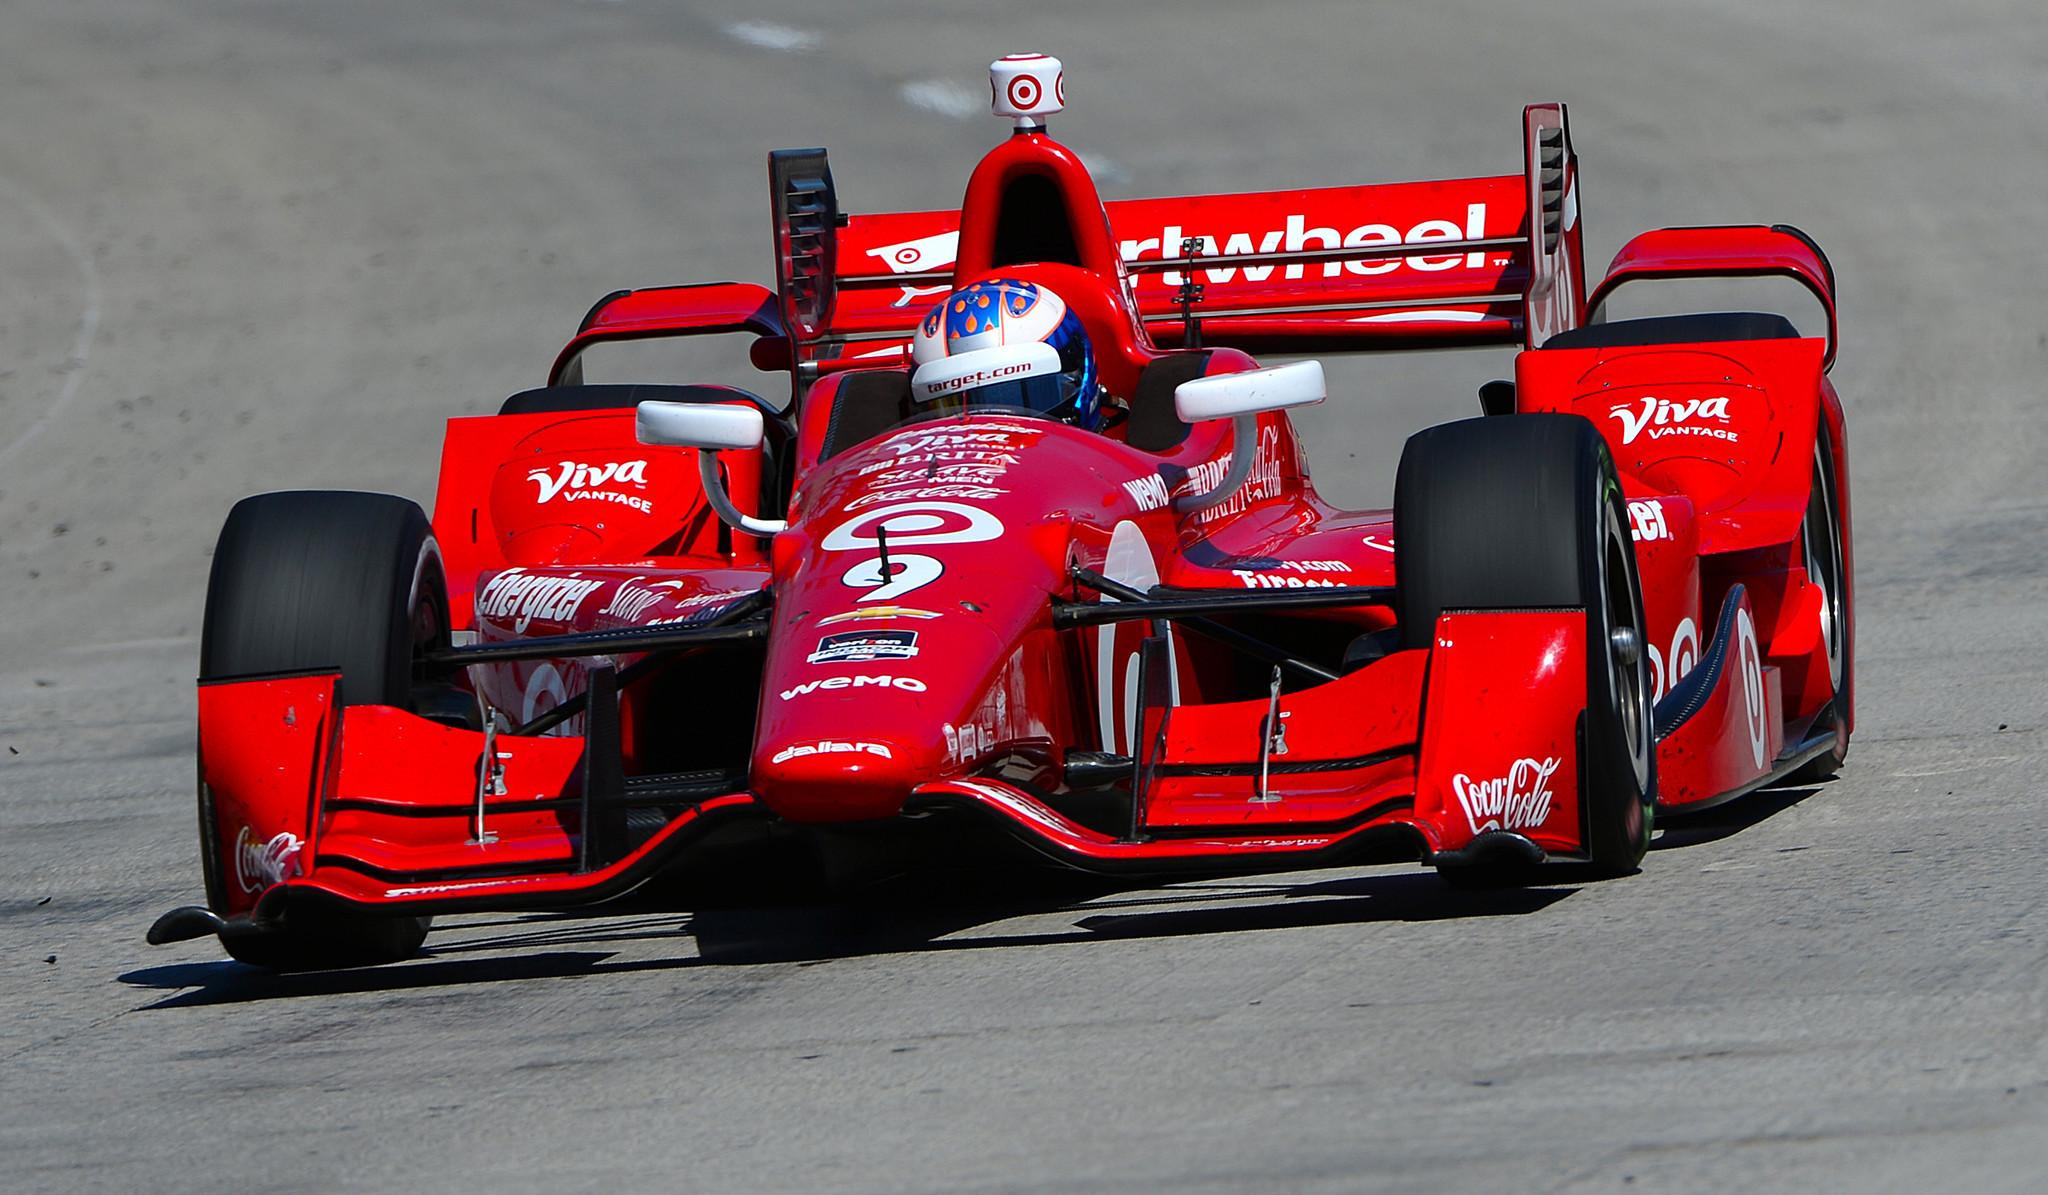 Scott Dixon wins his first Long Beach Grand Prix